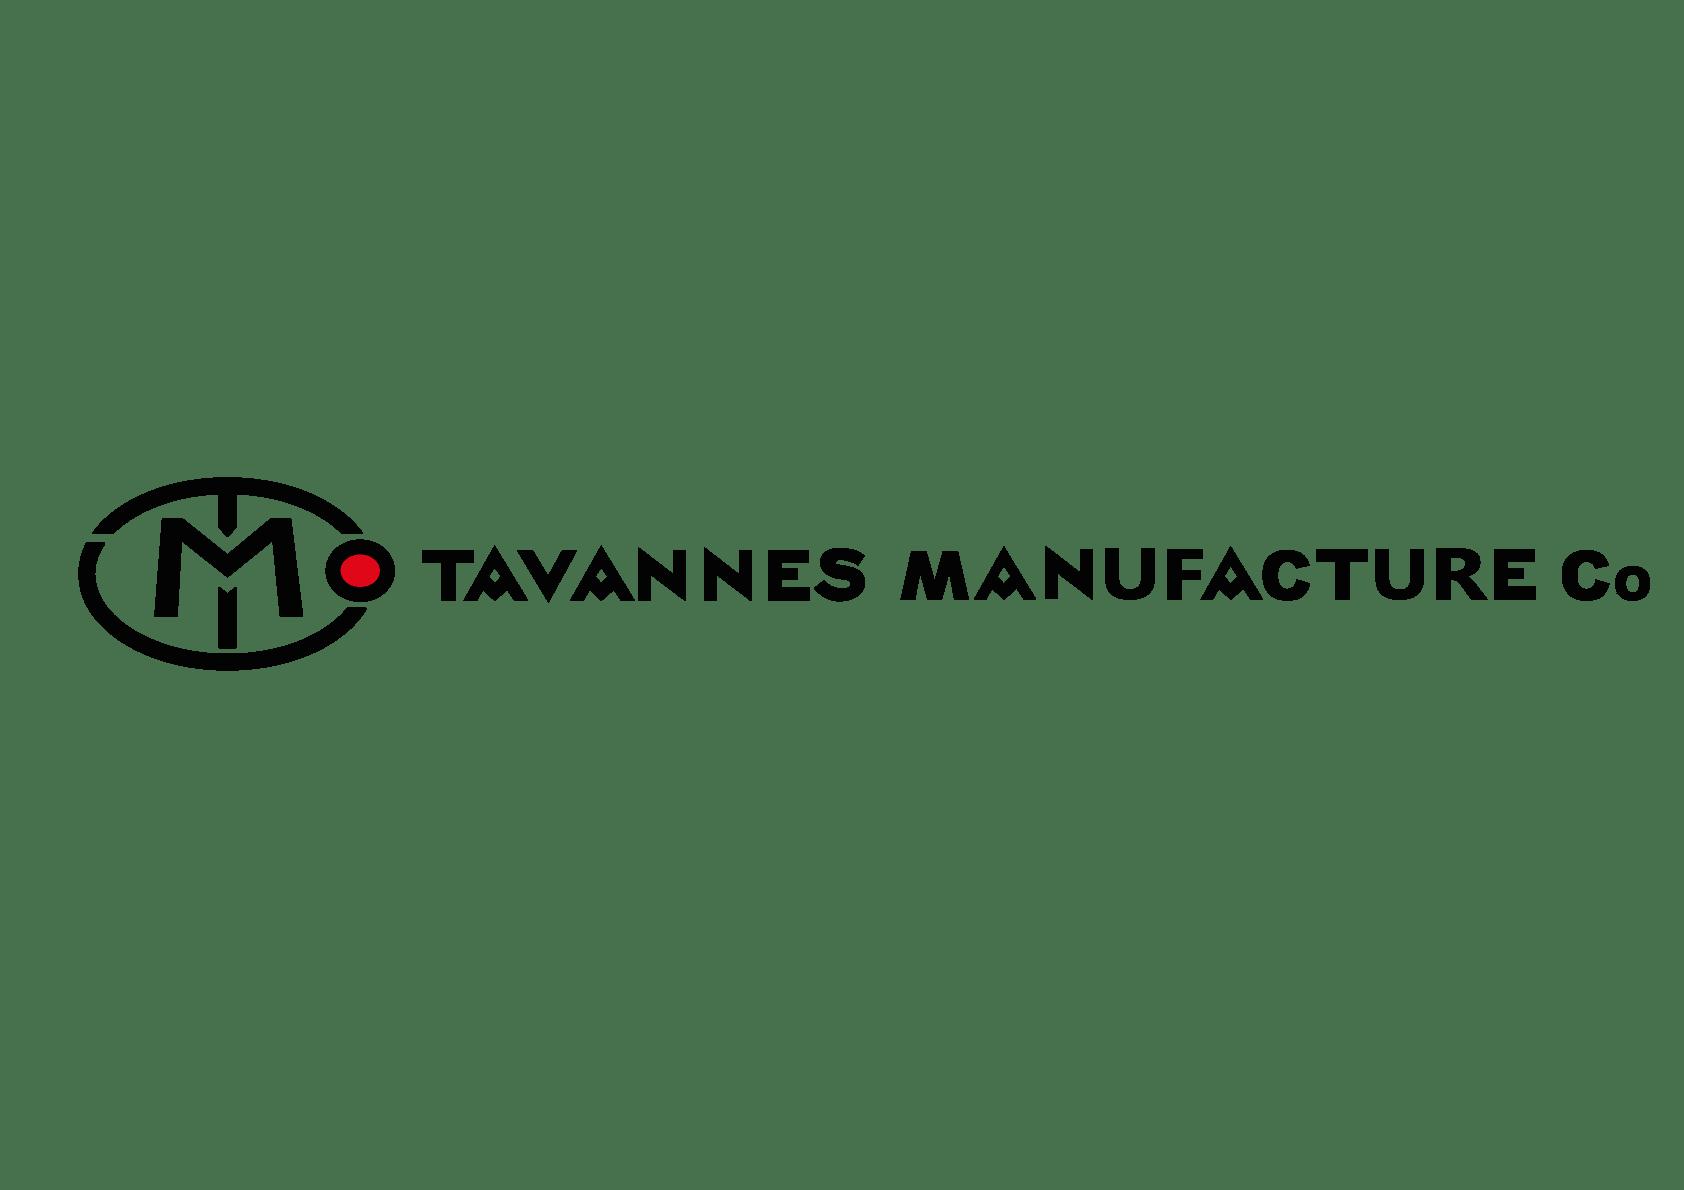 logo Manufacture texte